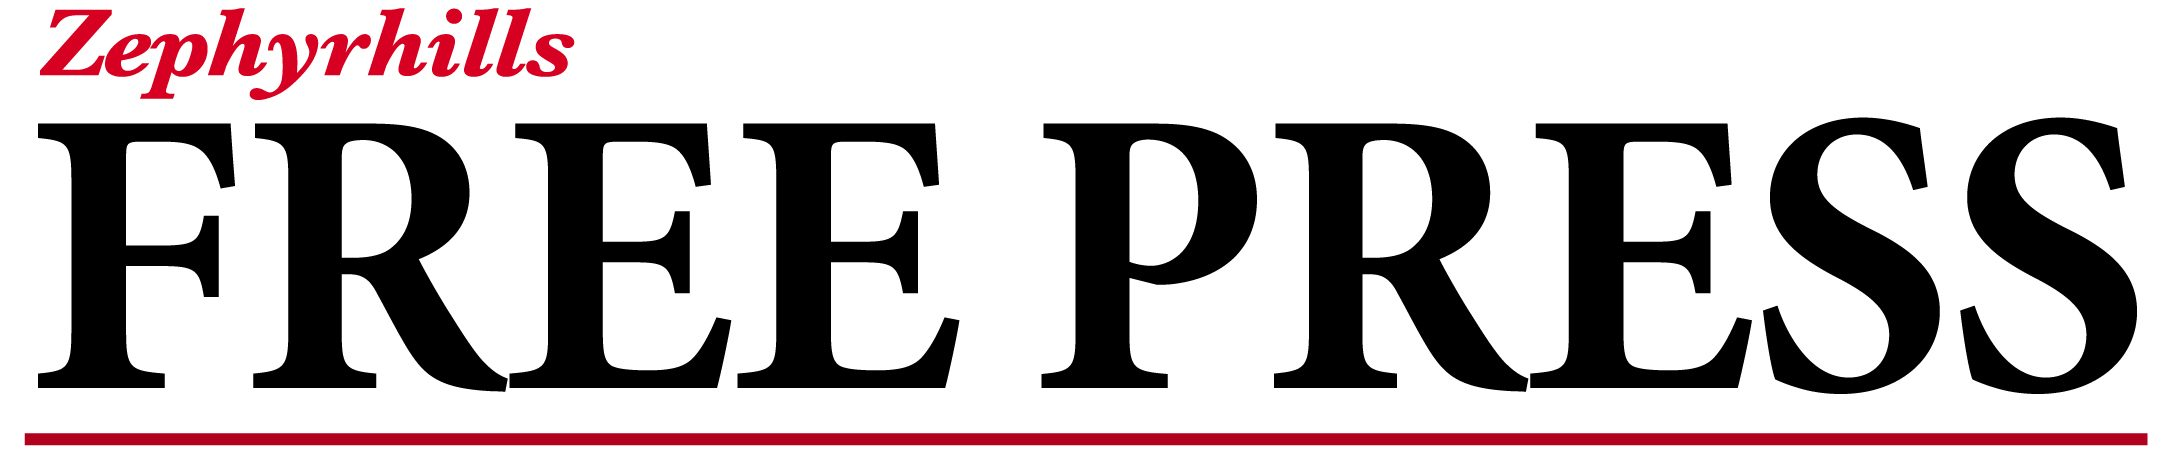 Zephyrhills Free Press